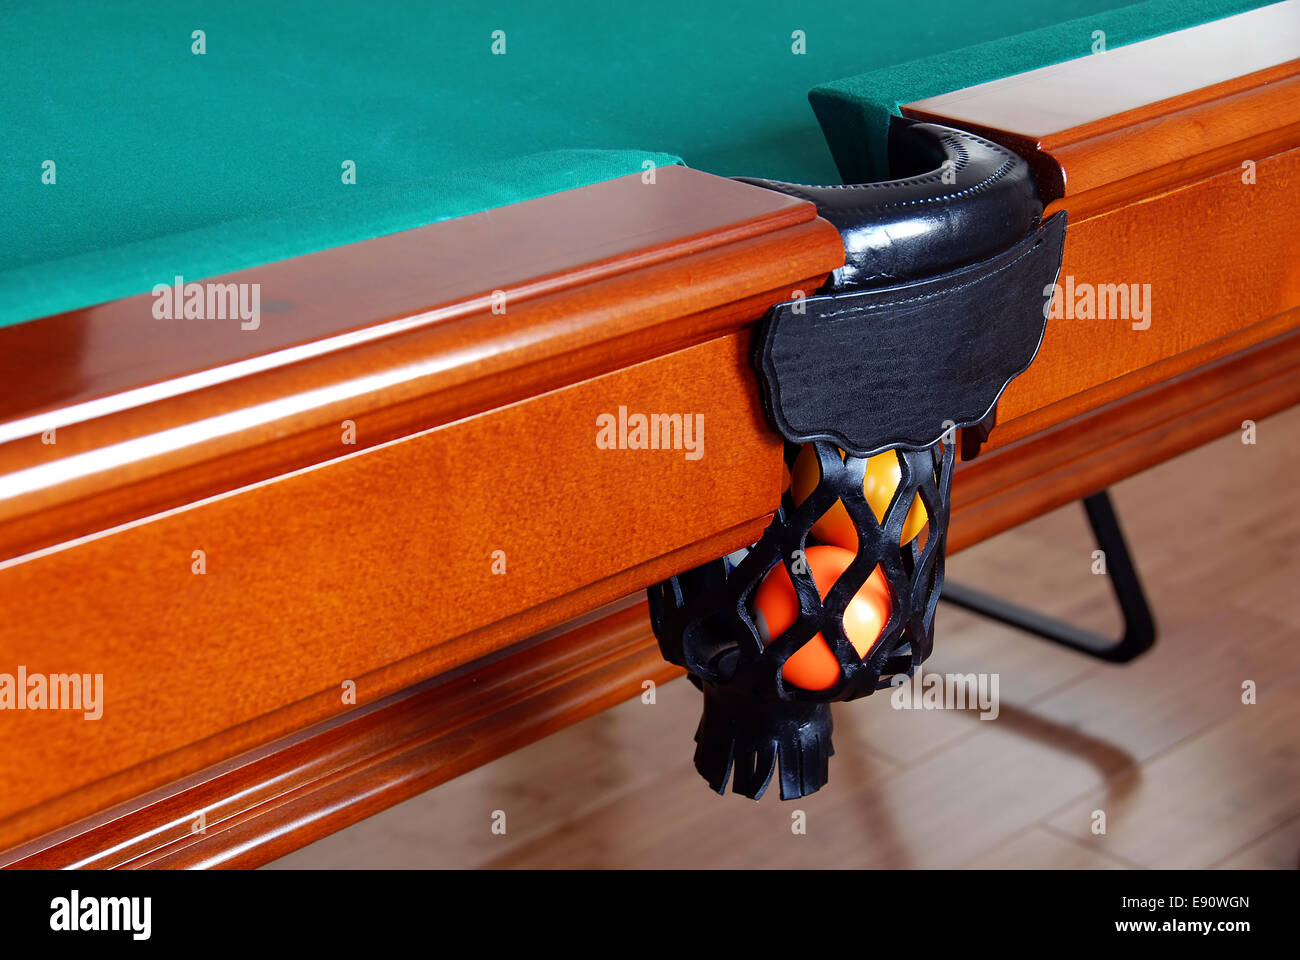 Balls in Billiards table pocket - Stock Image